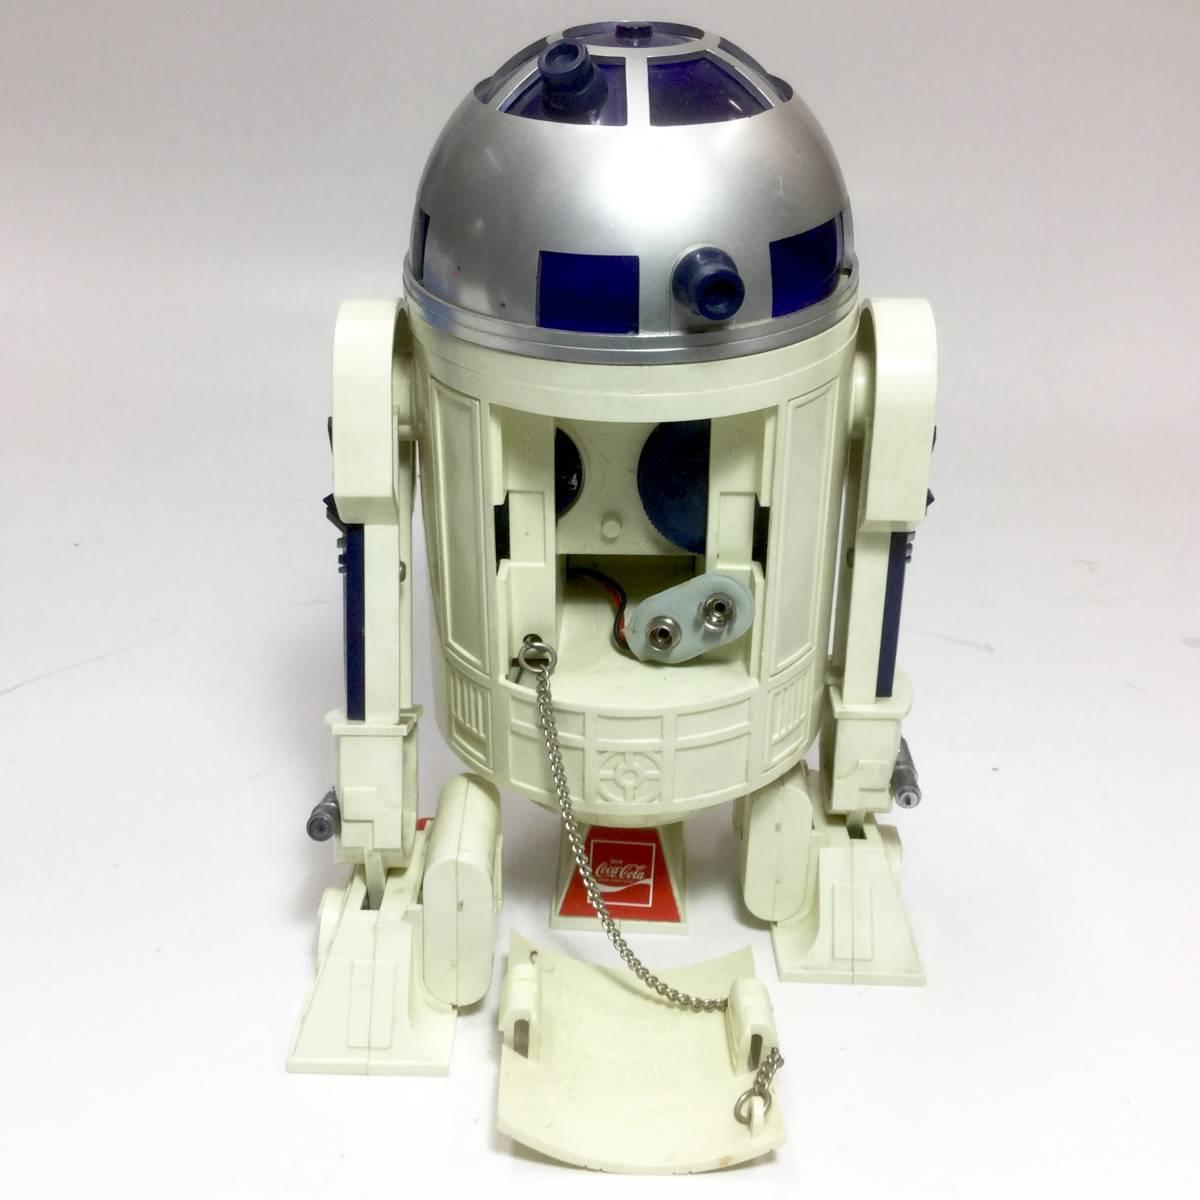 R2-D2 ラジオ 作動品 スターウォーズ 1977年版 コカコーラ 懸賞品 非売品 レトロ ビンテージ _画像8